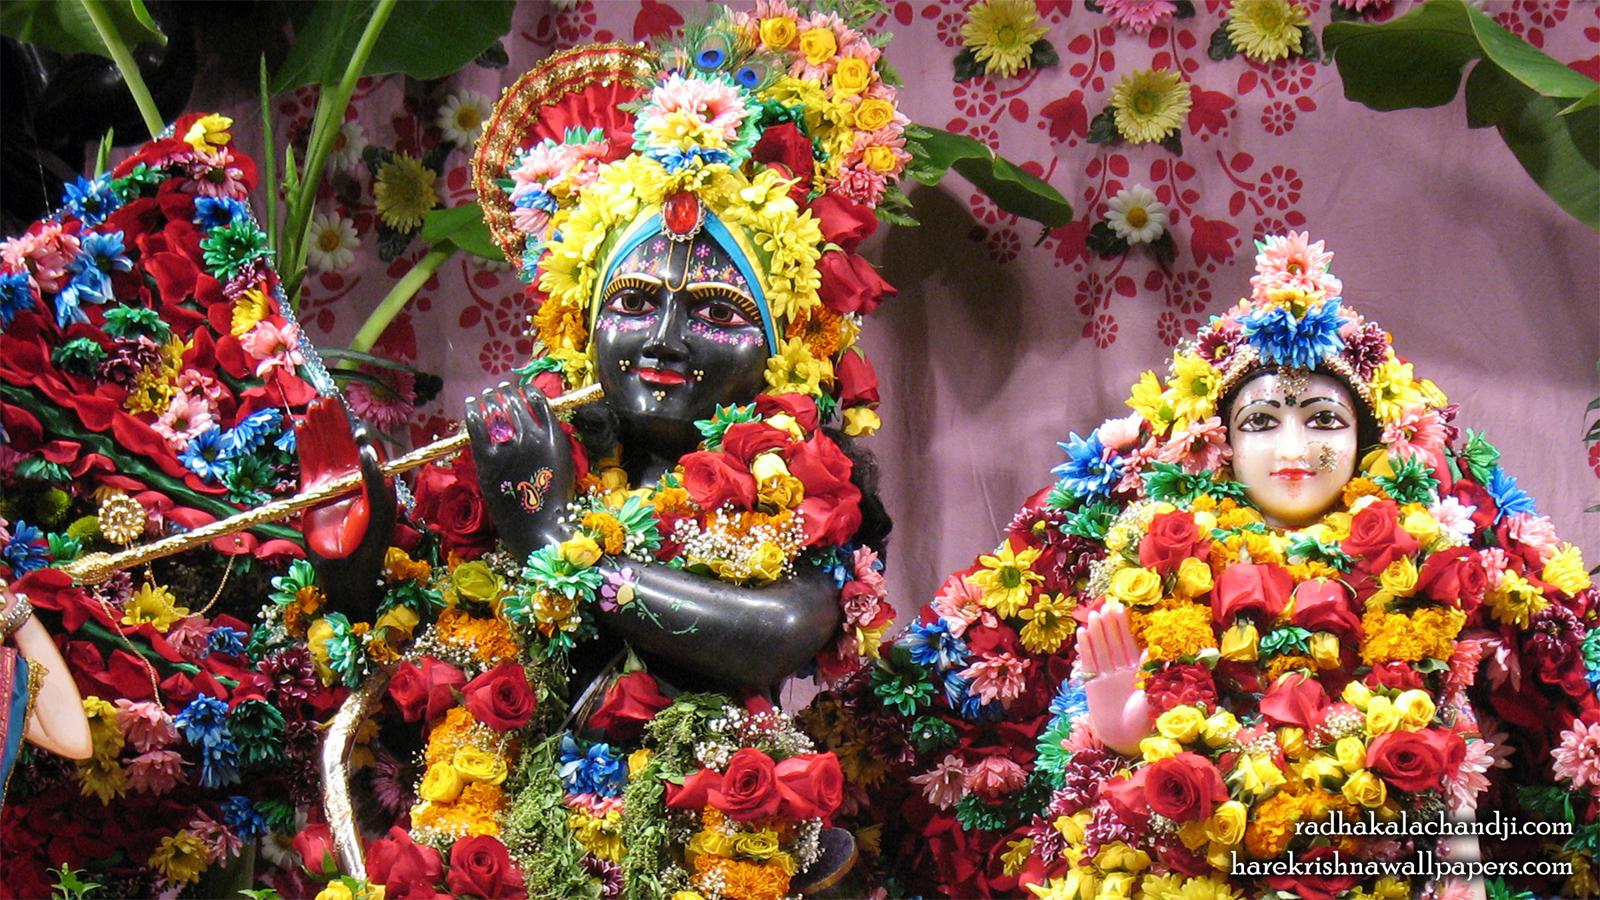 Sri Sri Radha Kalachanda Close up Wallpaper (001) Size 1600x900 Download